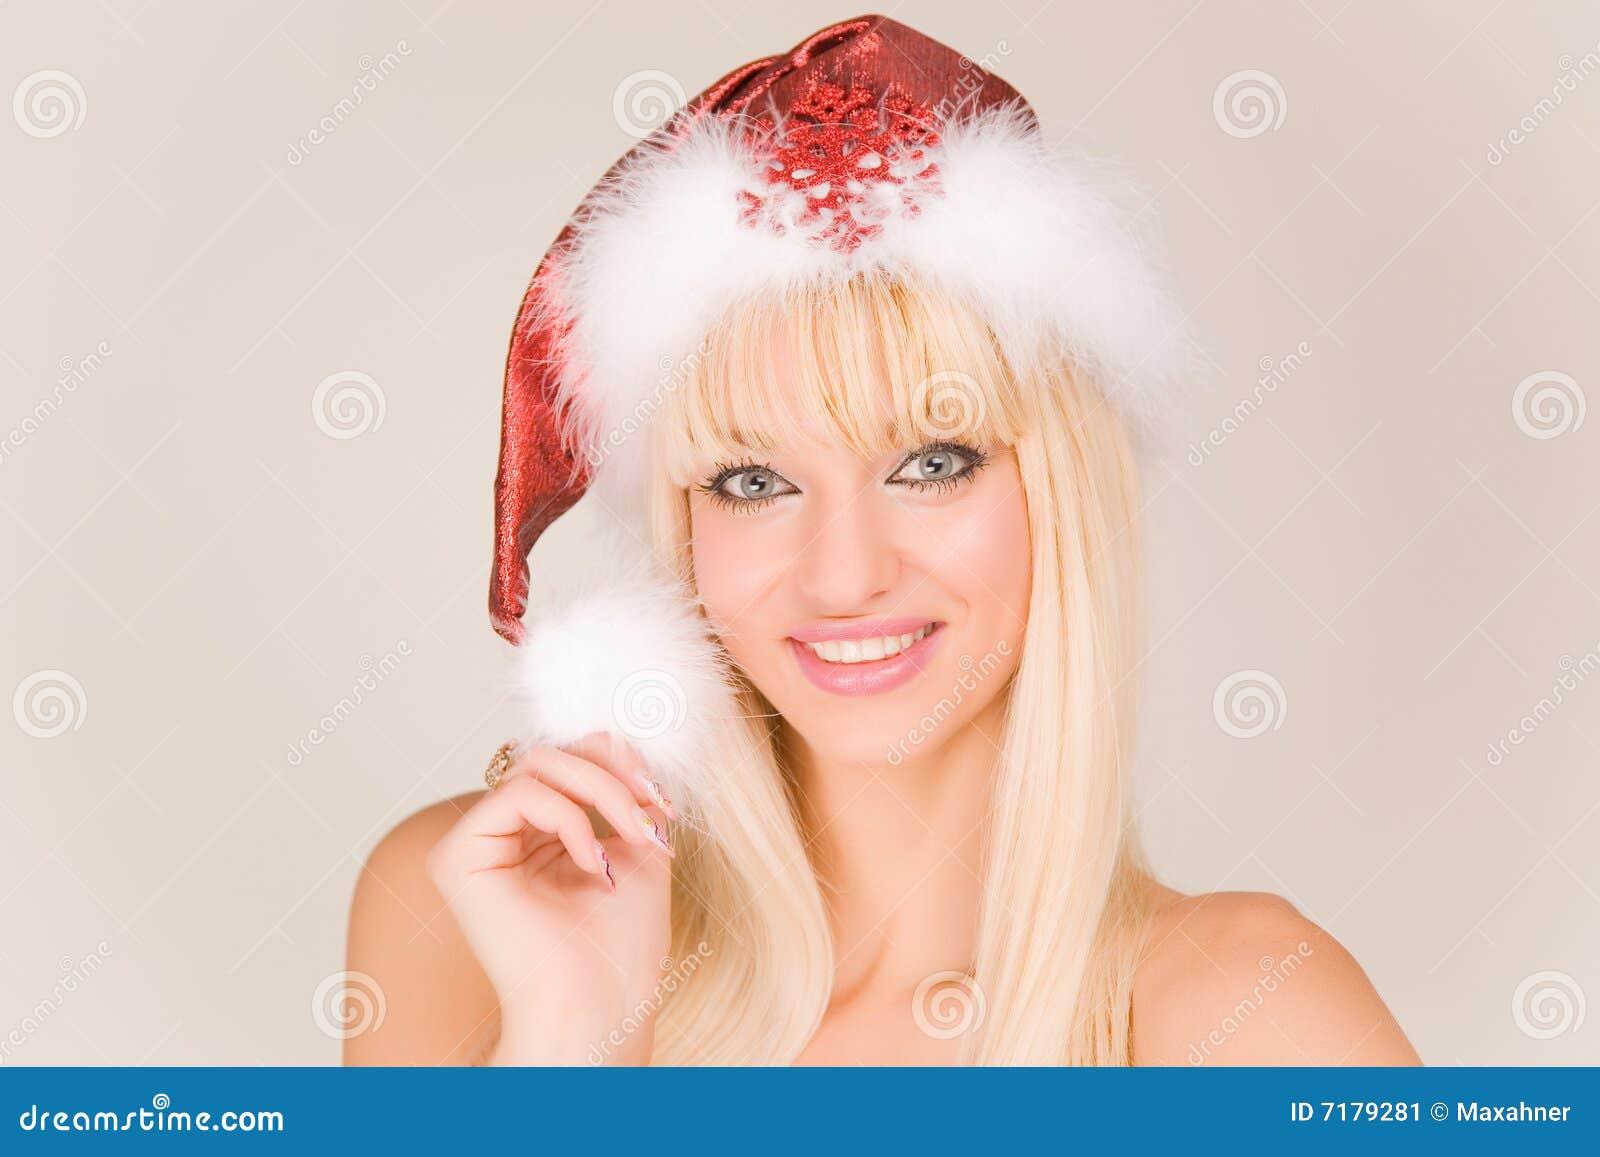 Mrs santa sexy smiling